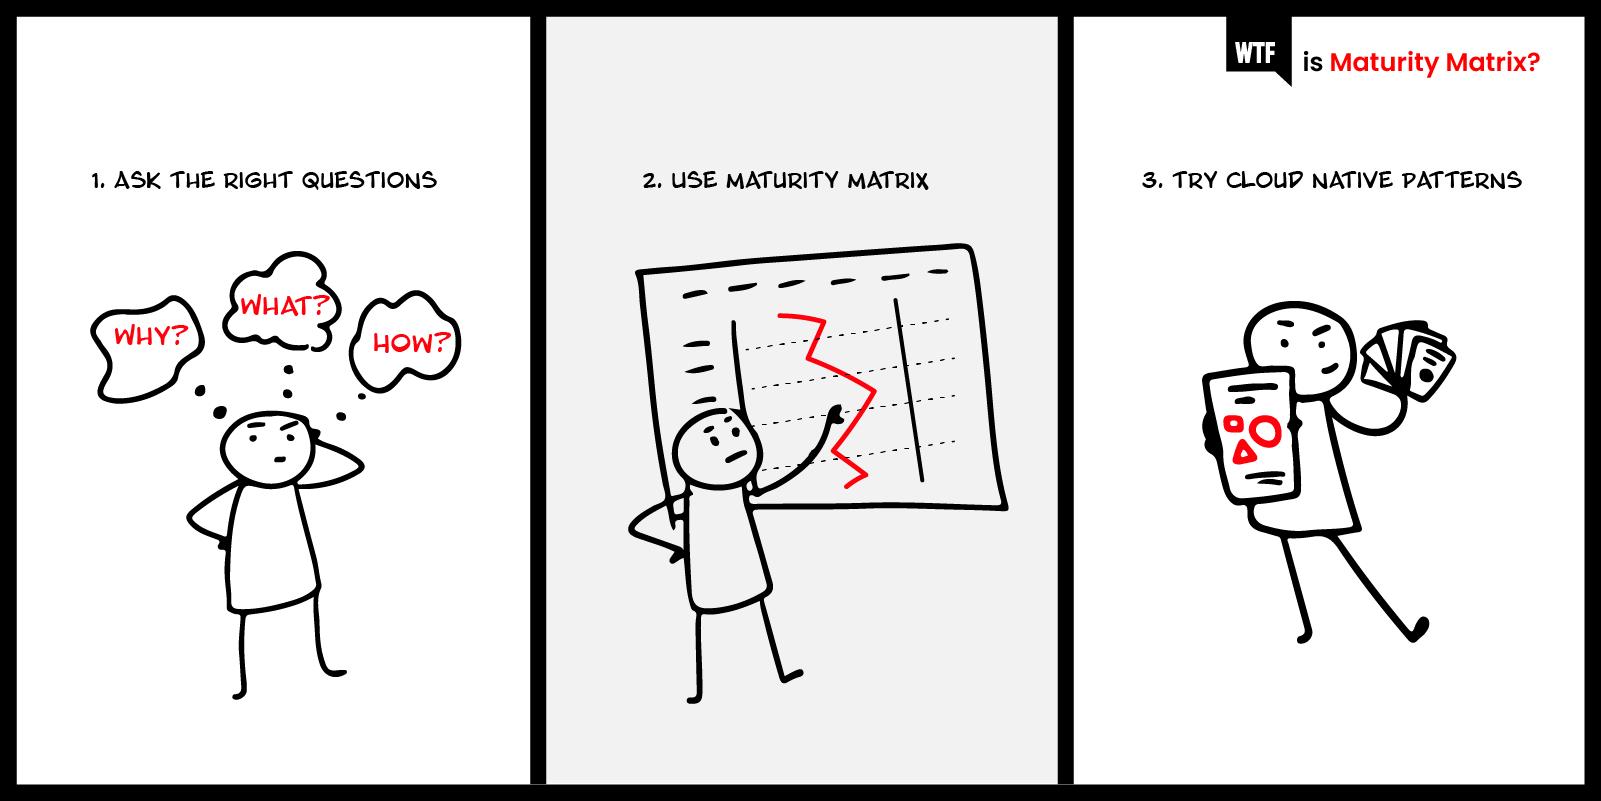 wtf-is-maturity-matrix-wtf-is-cn-transformation blog-1